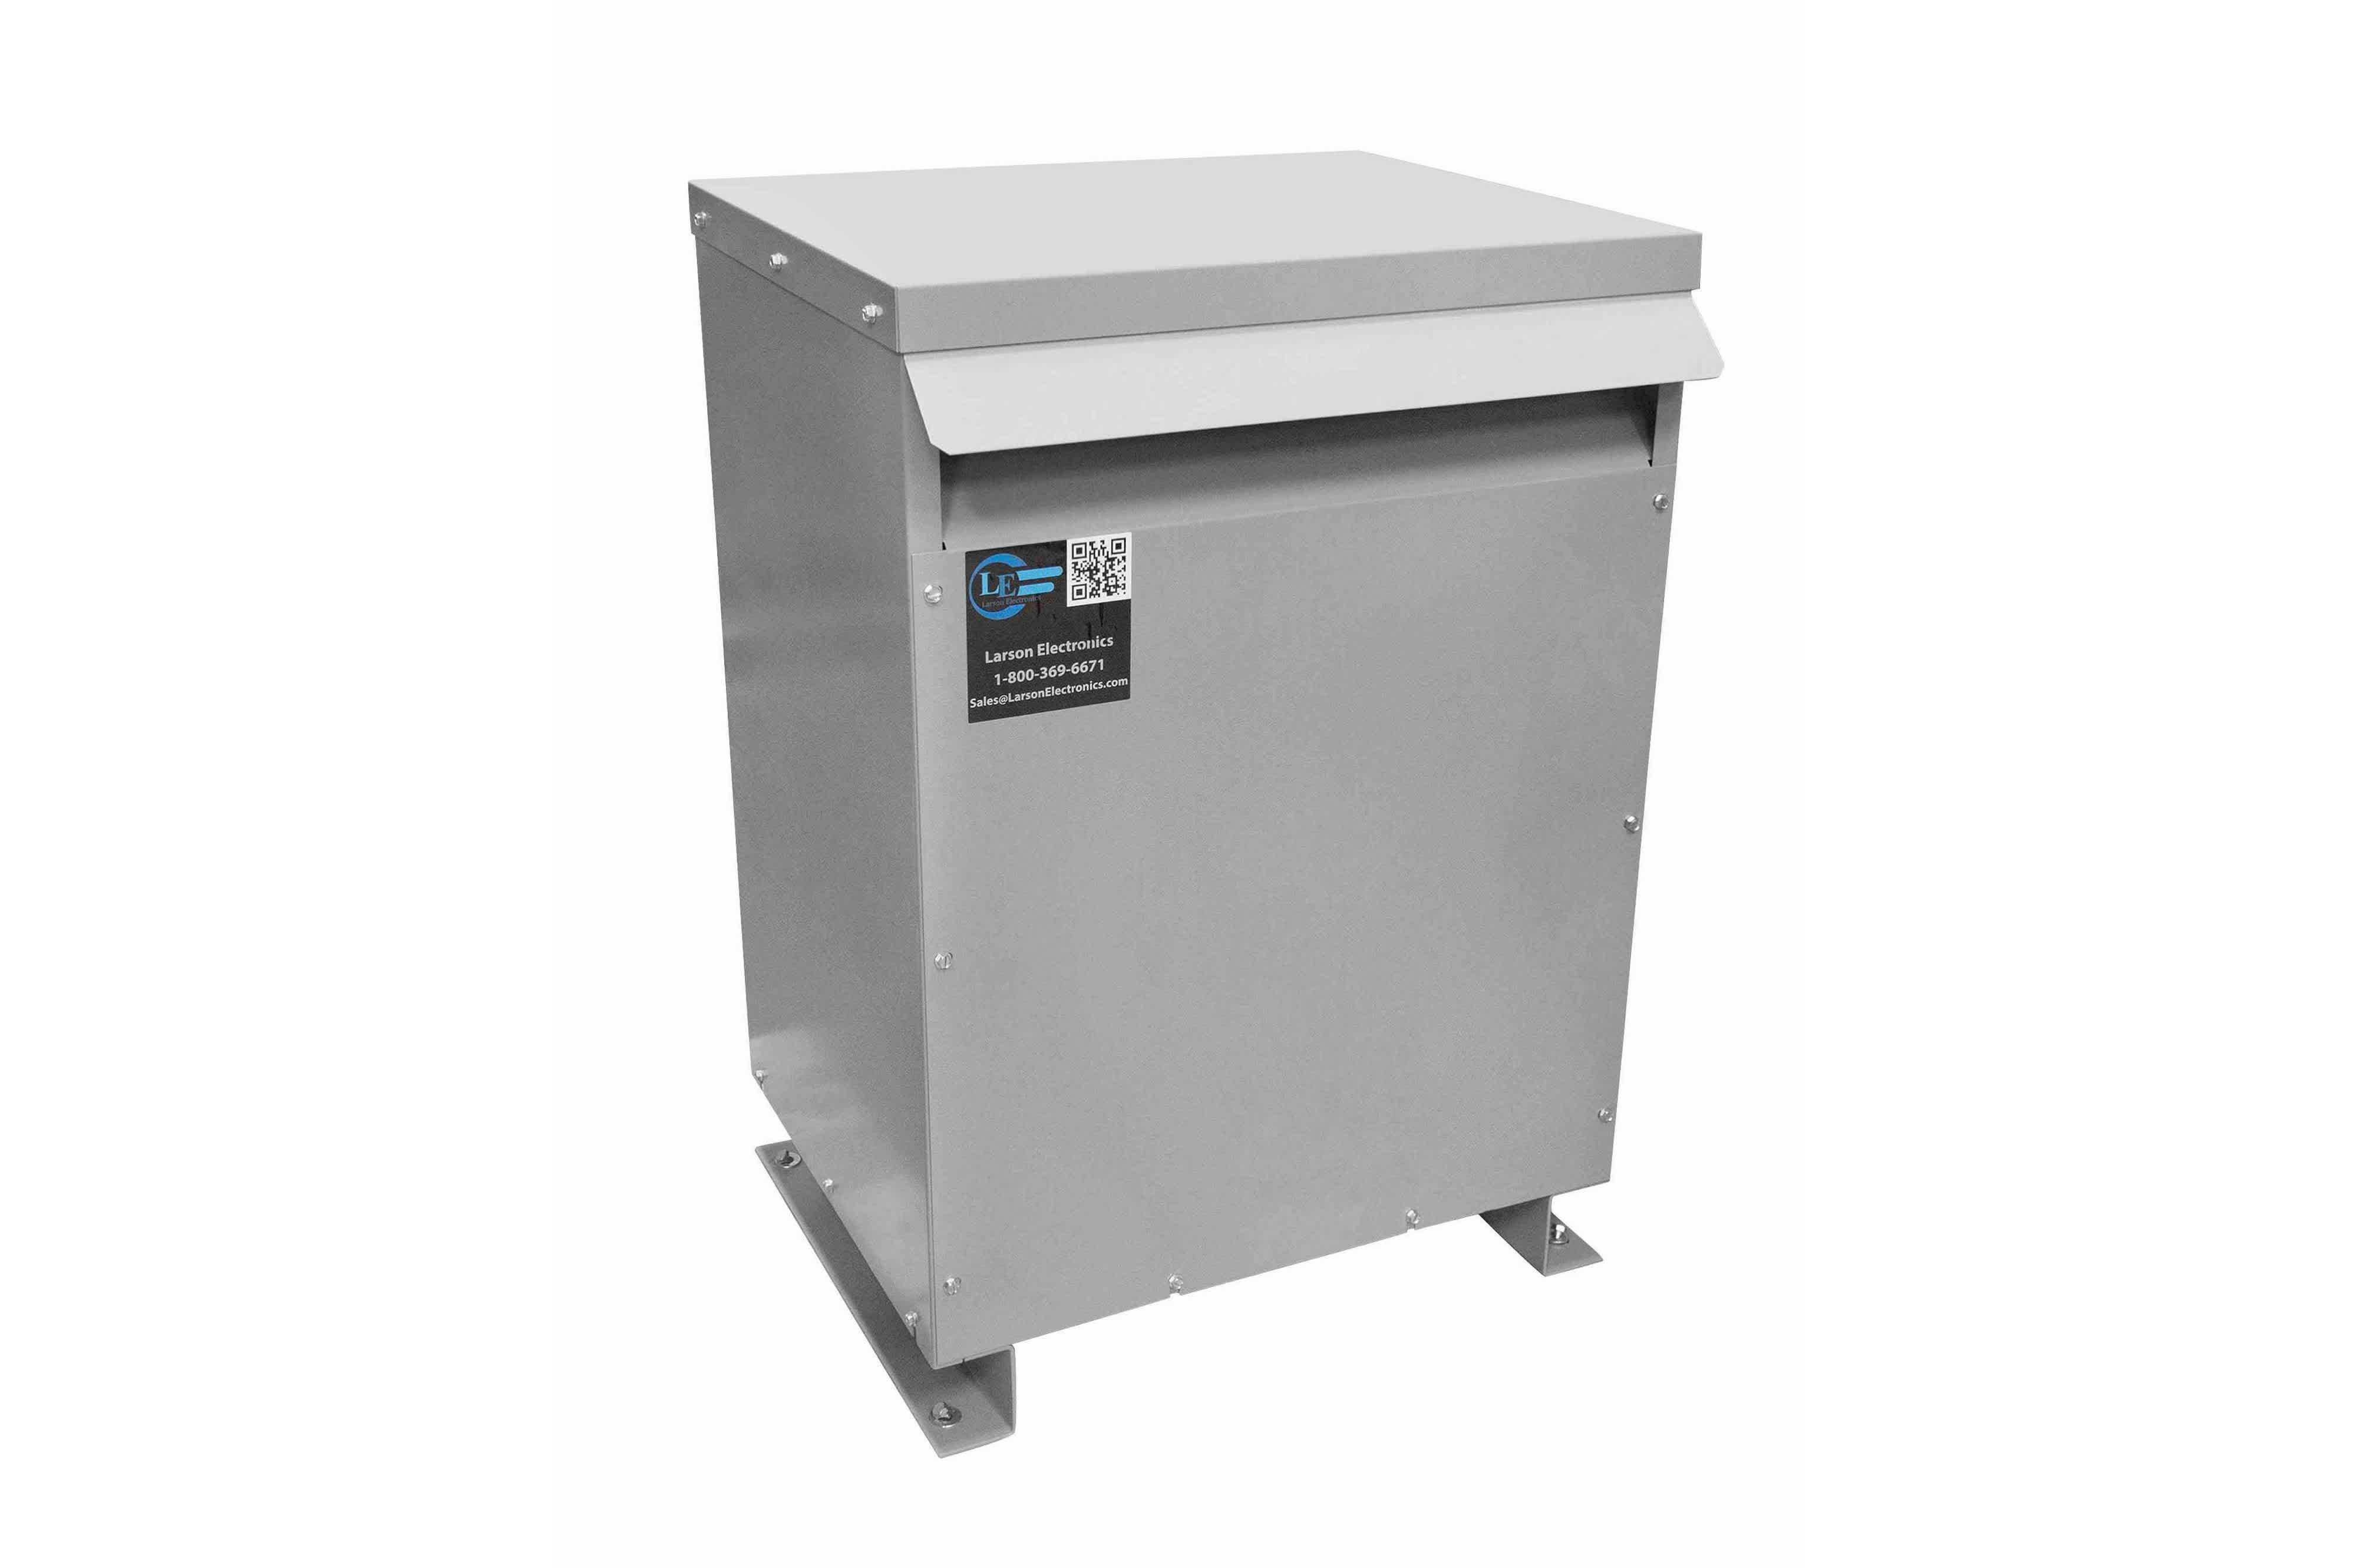 900 kVA 3PH Isolation Transformer, 380V Wye Primary, 600V Delta Secondary, N3R, Ventilated, 60 Hz